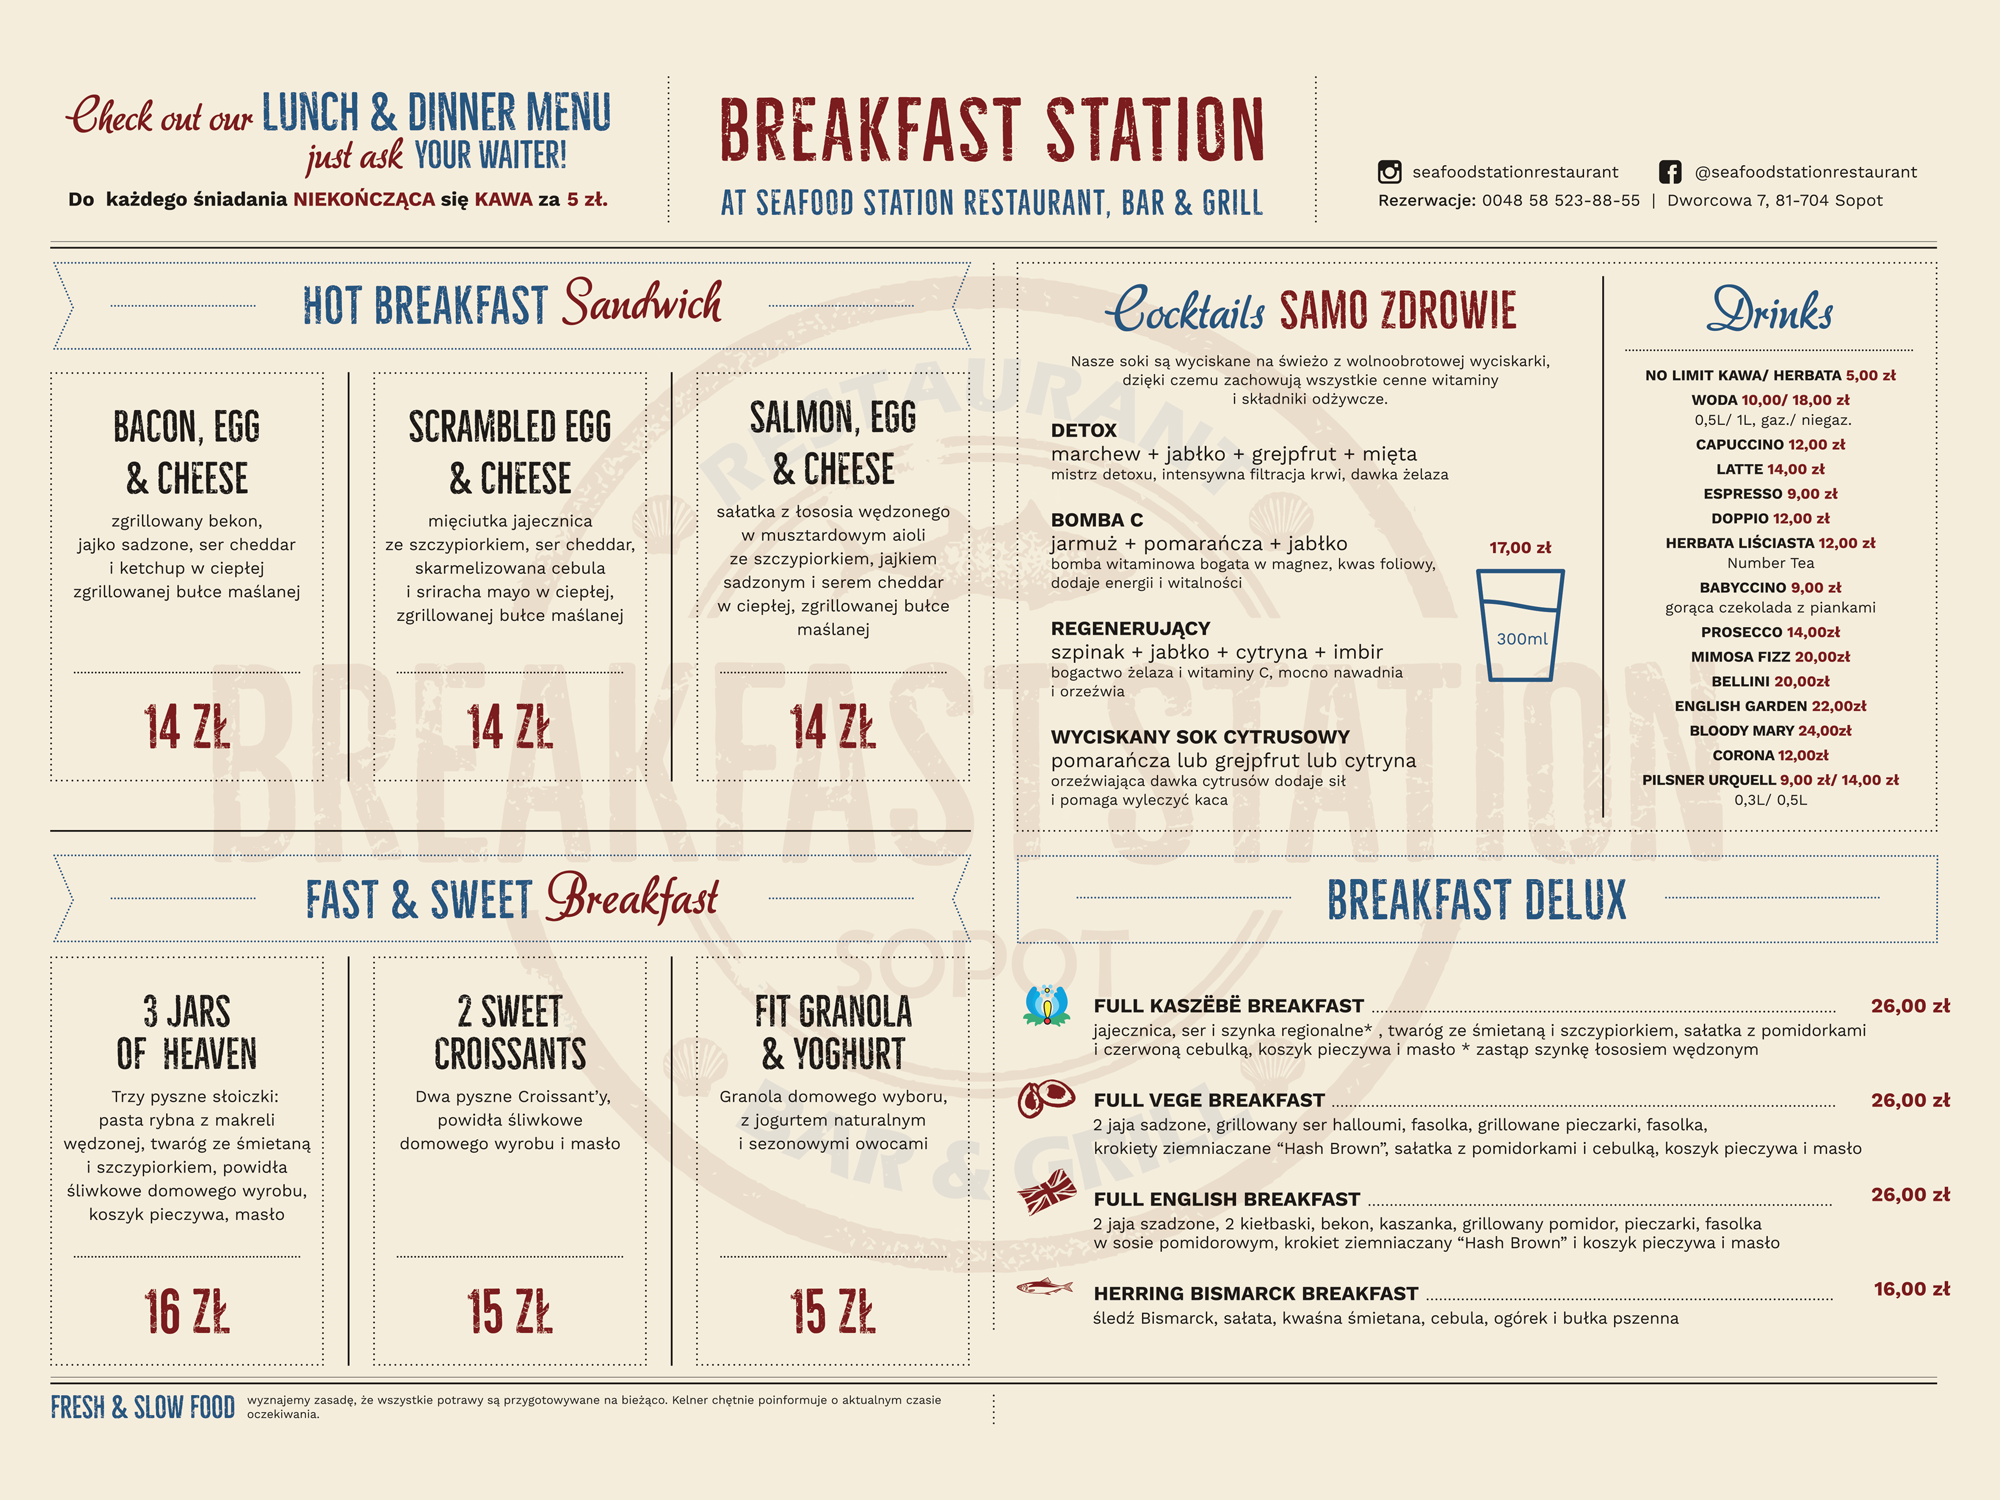 menu_breakfaststation_pl_042019_400mmx300mm_web